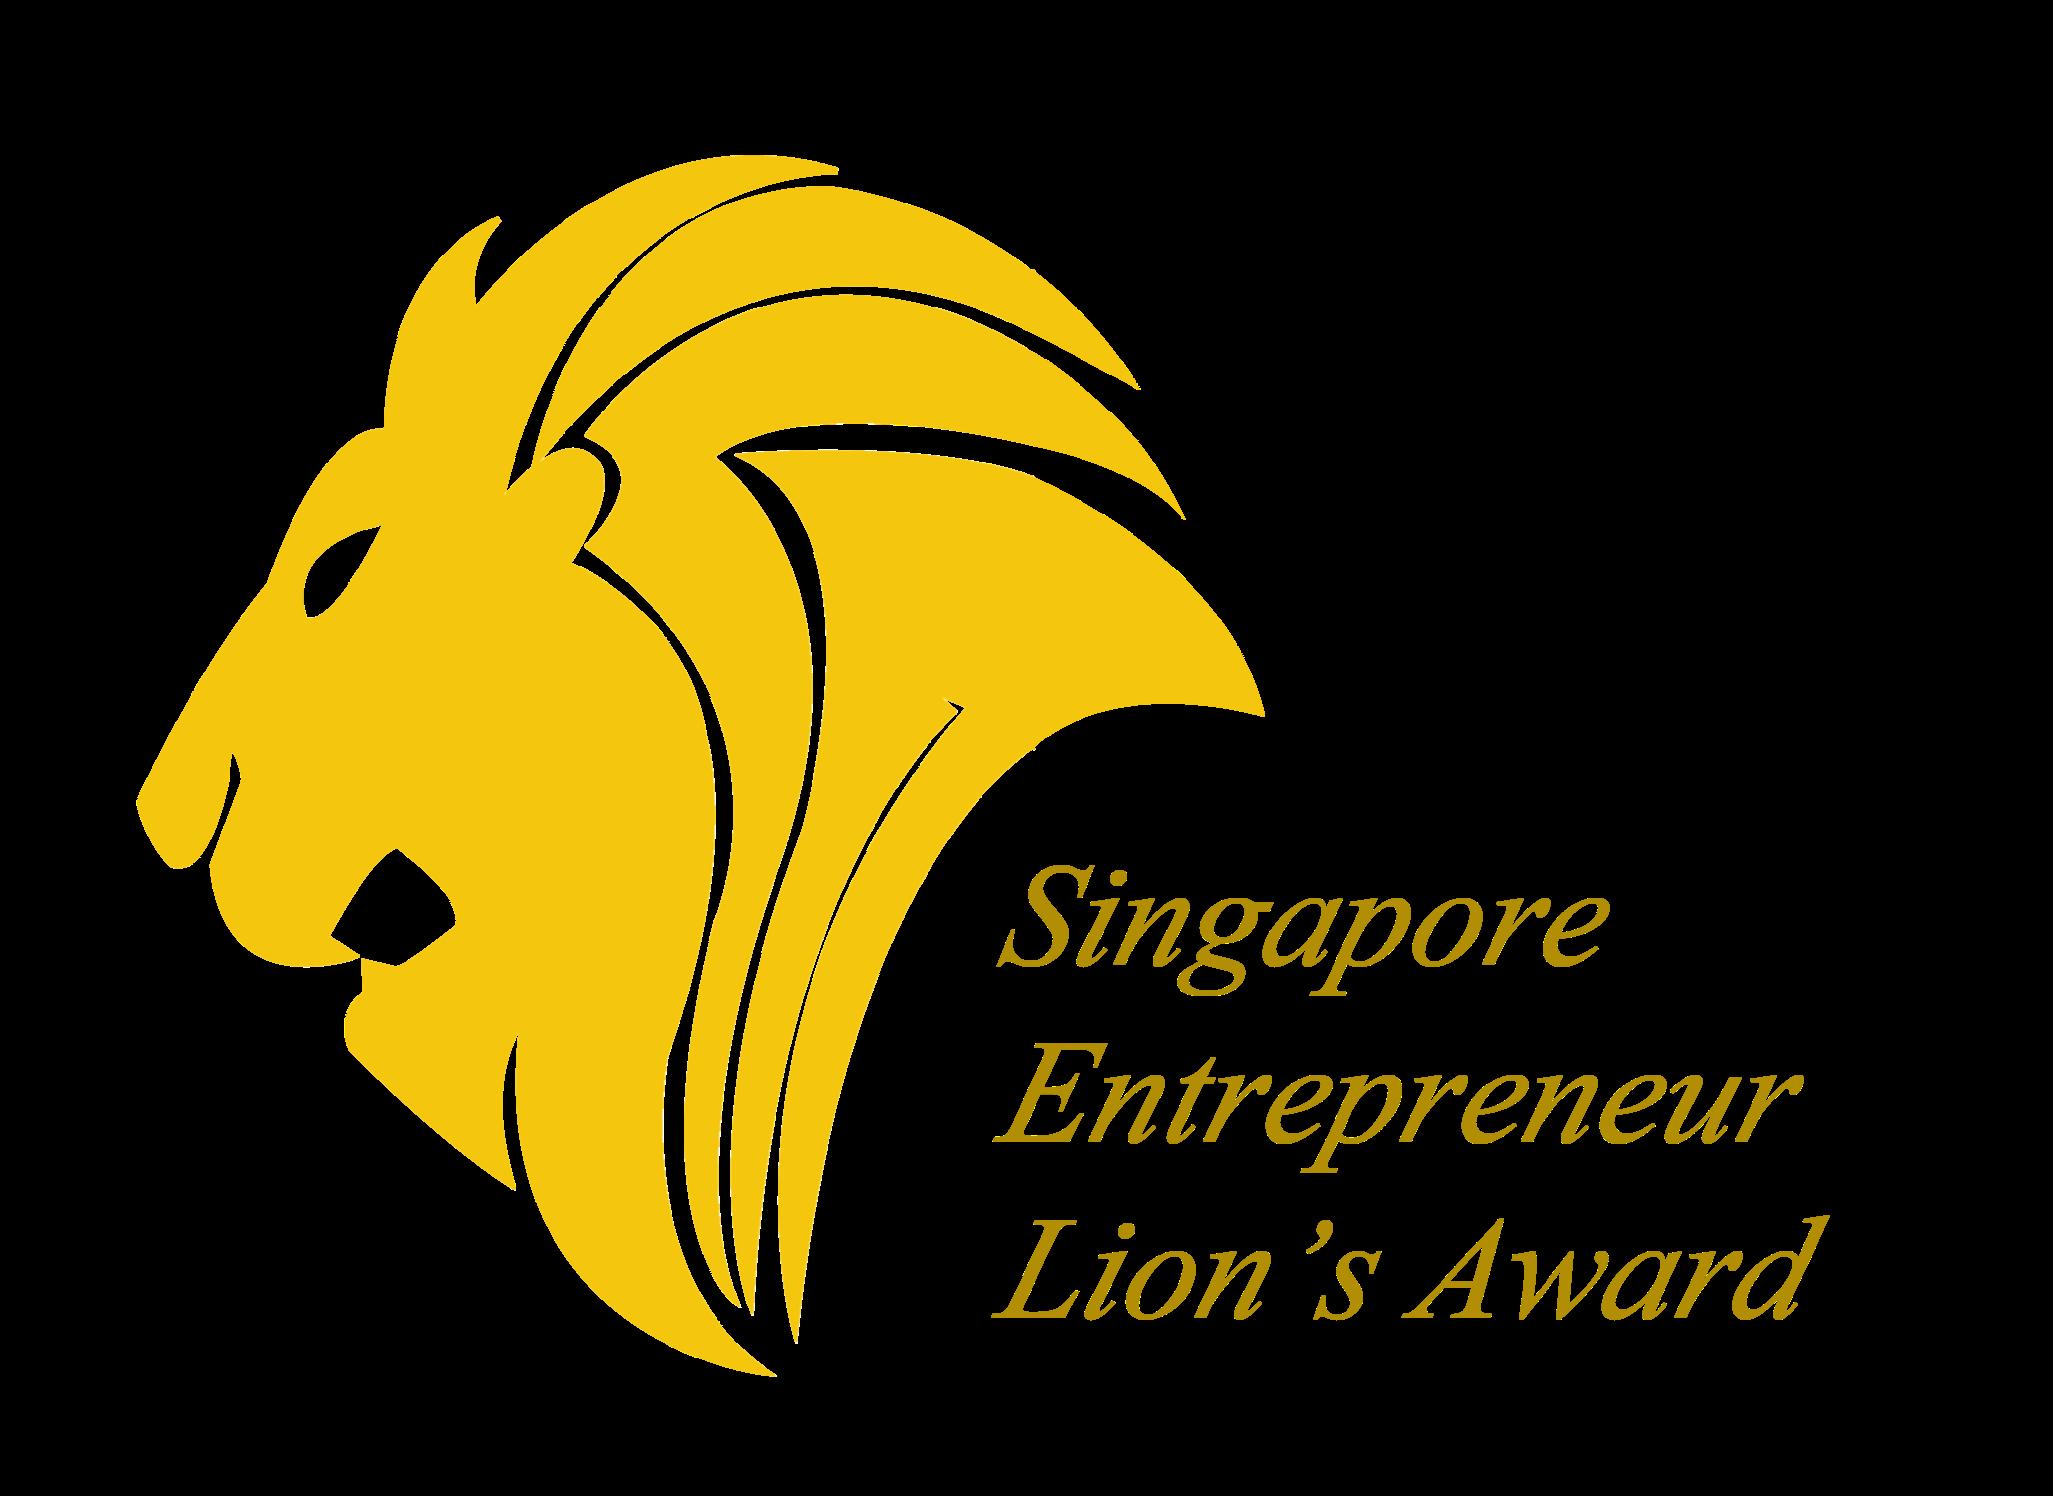 singapore entrepreneur lion's award logo.png